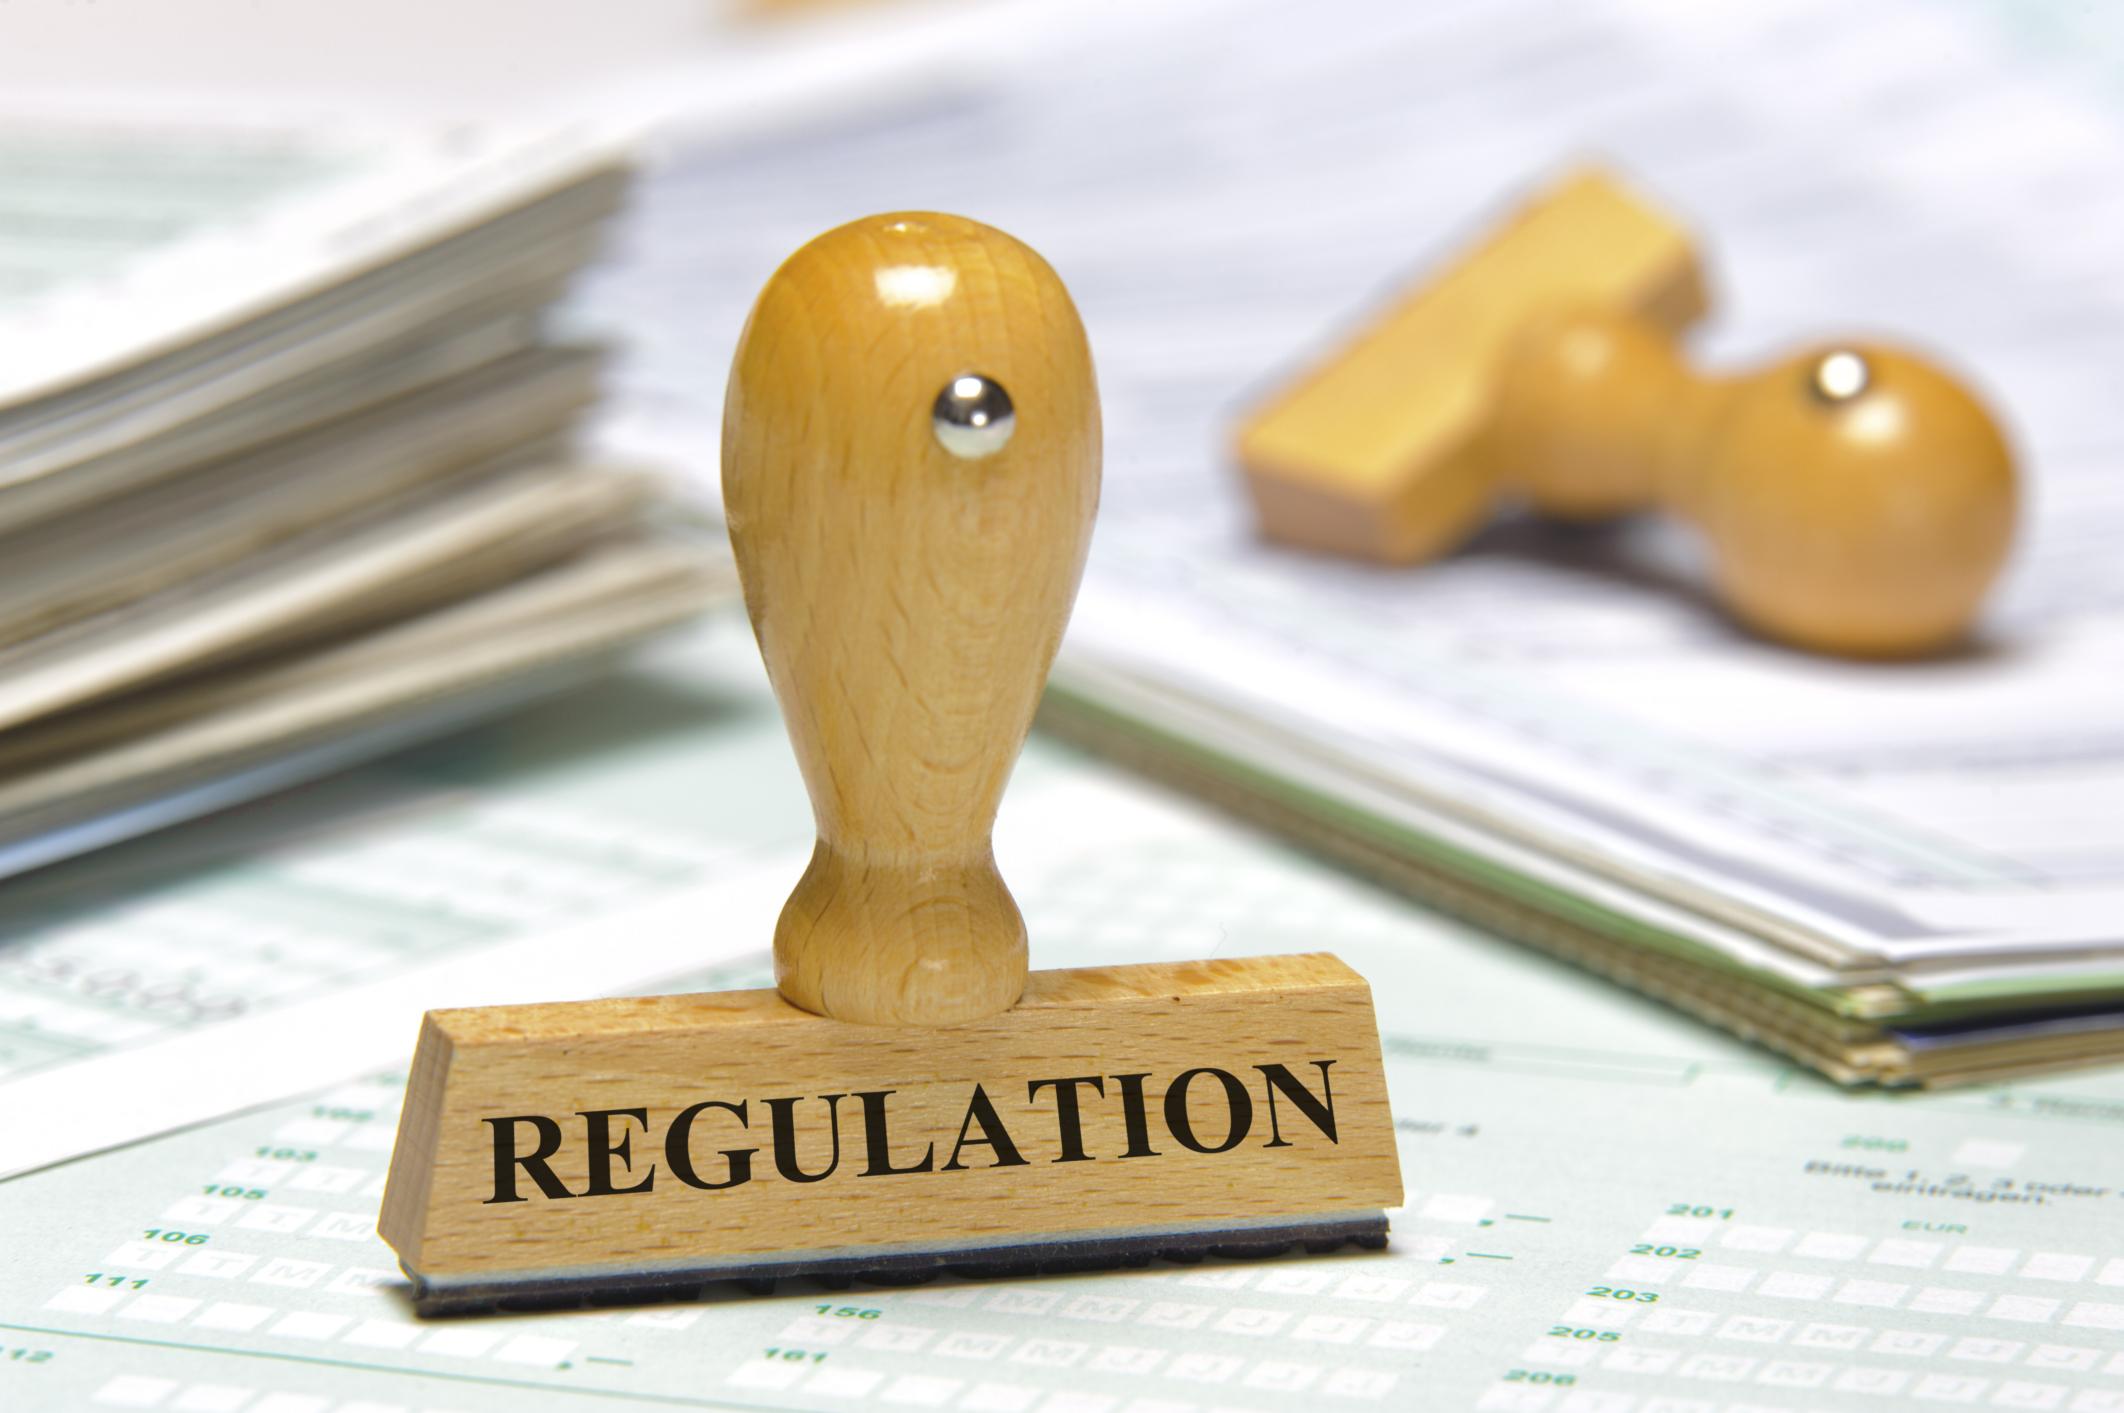 astrealegal associates llp banking regulation Education Clip Art Borders School Clip Art